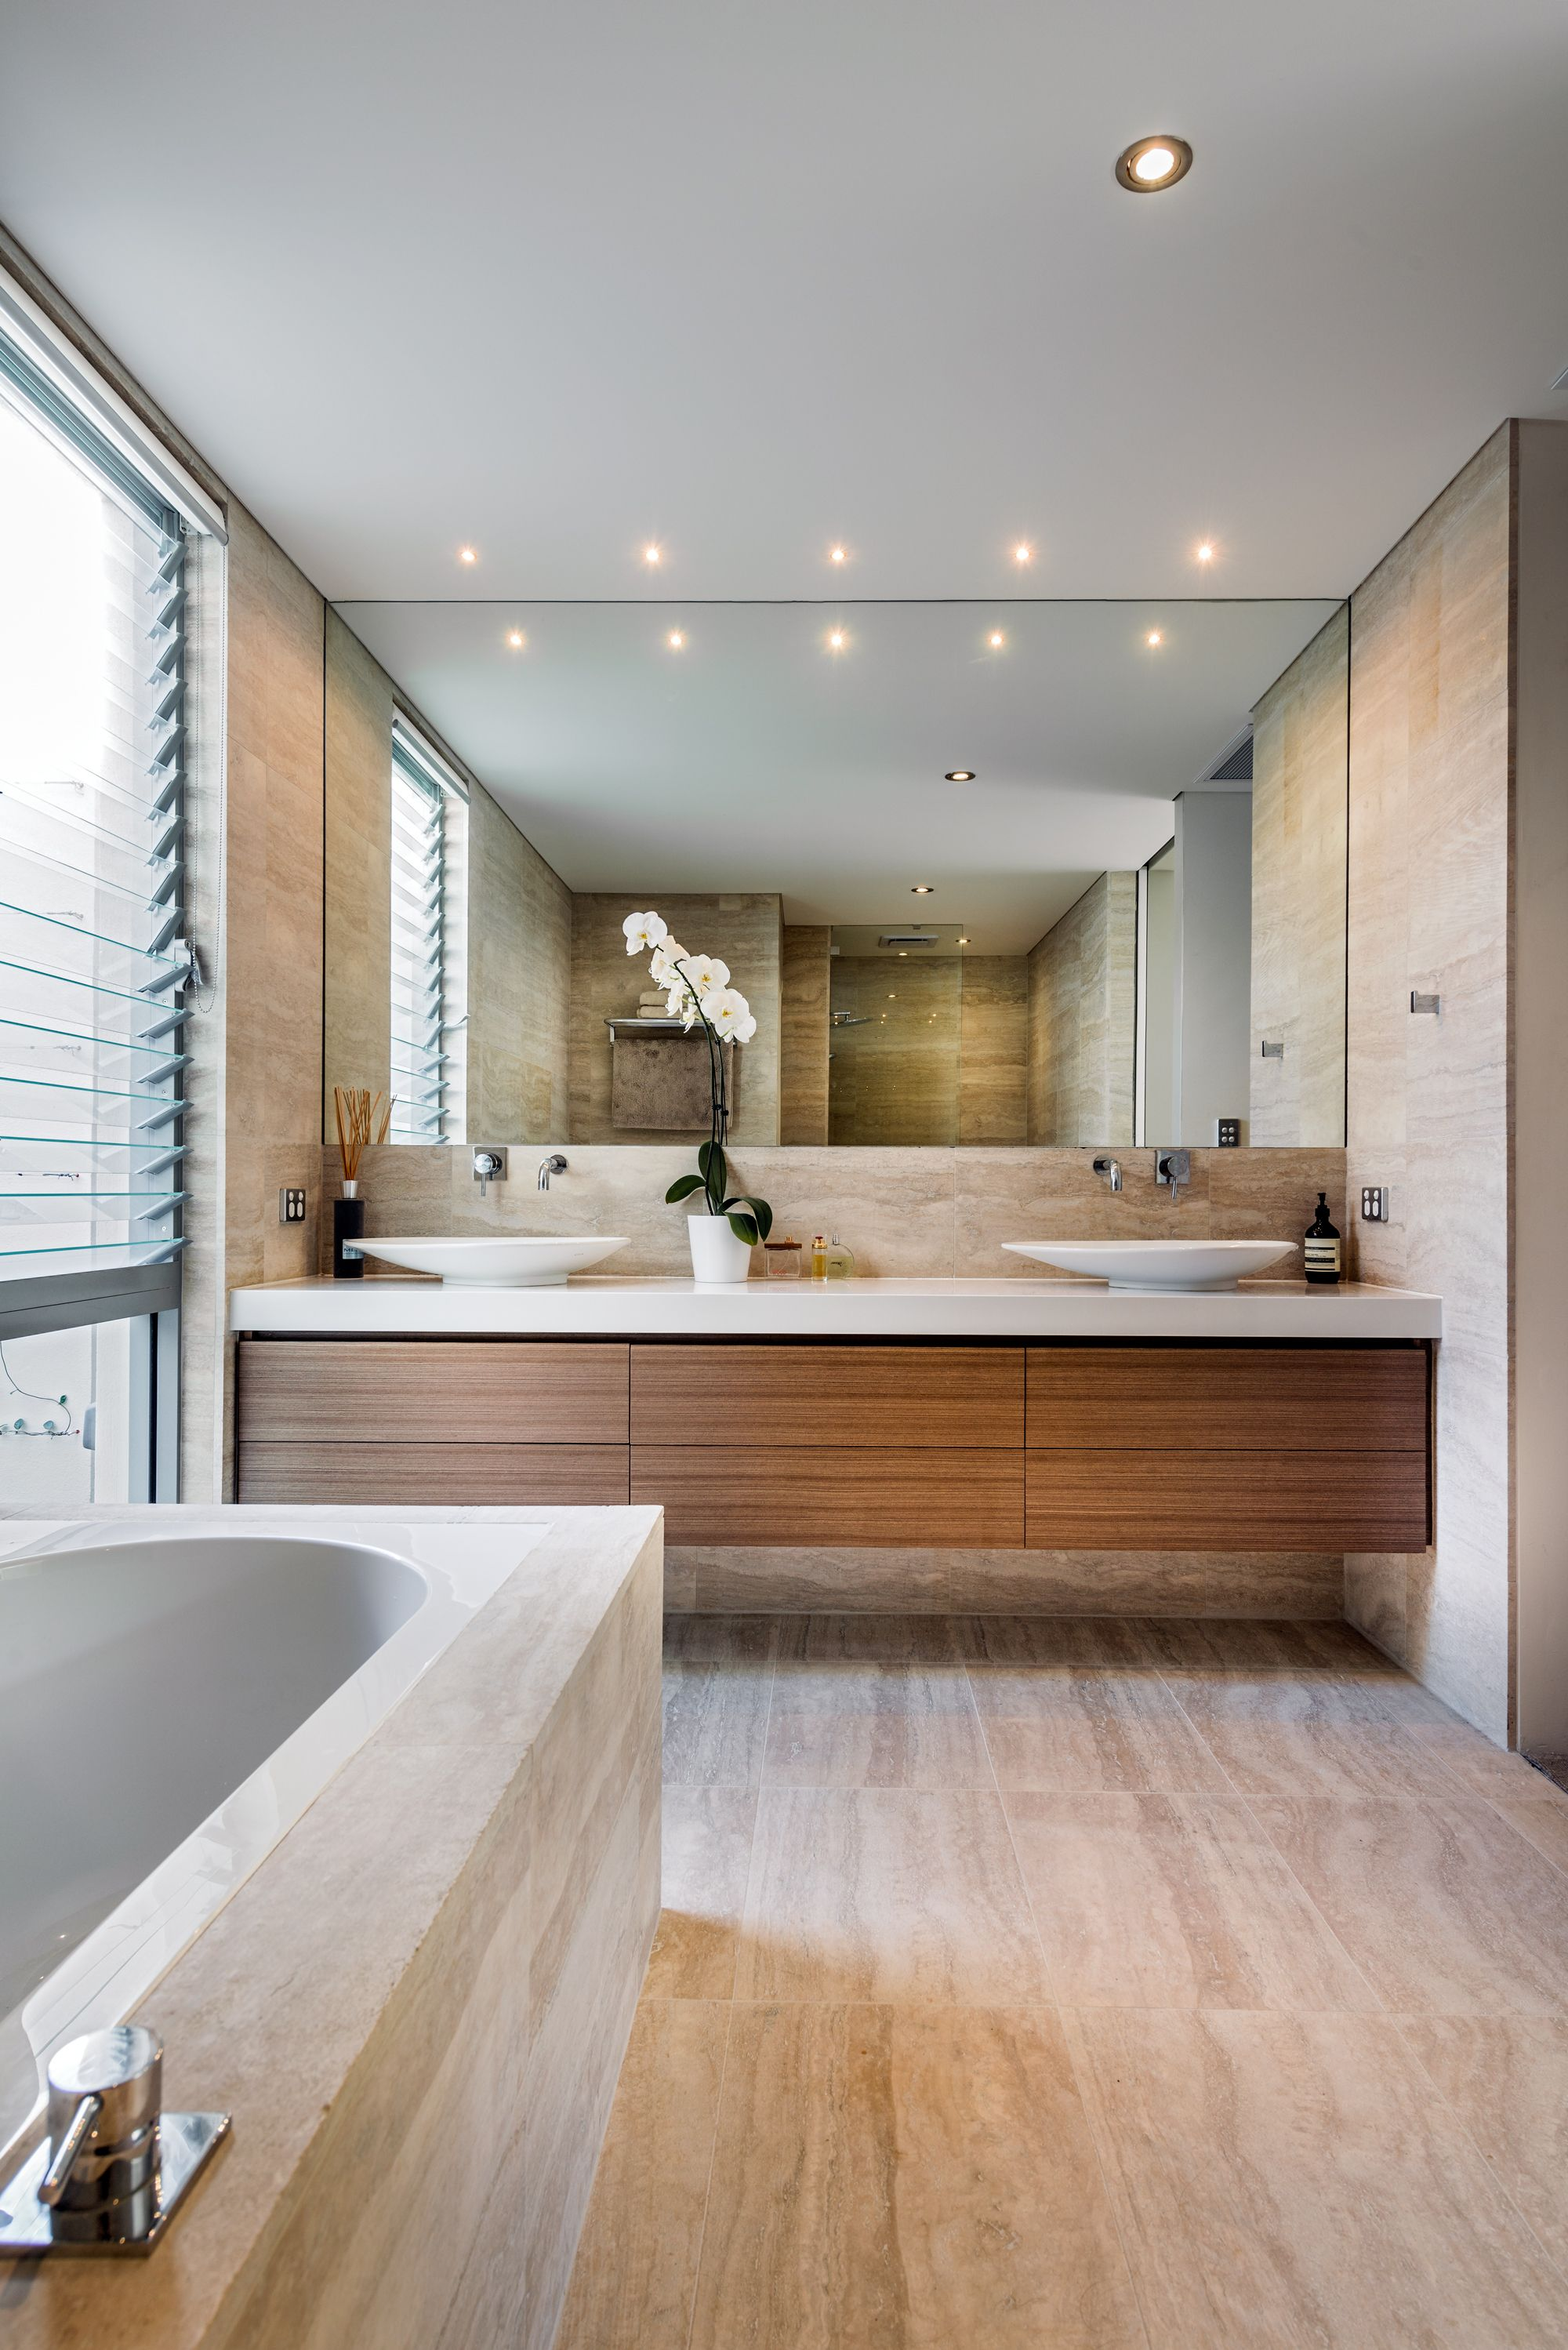 Swell Homes Ozone Modern Bathroom Design Bathroom Remodel